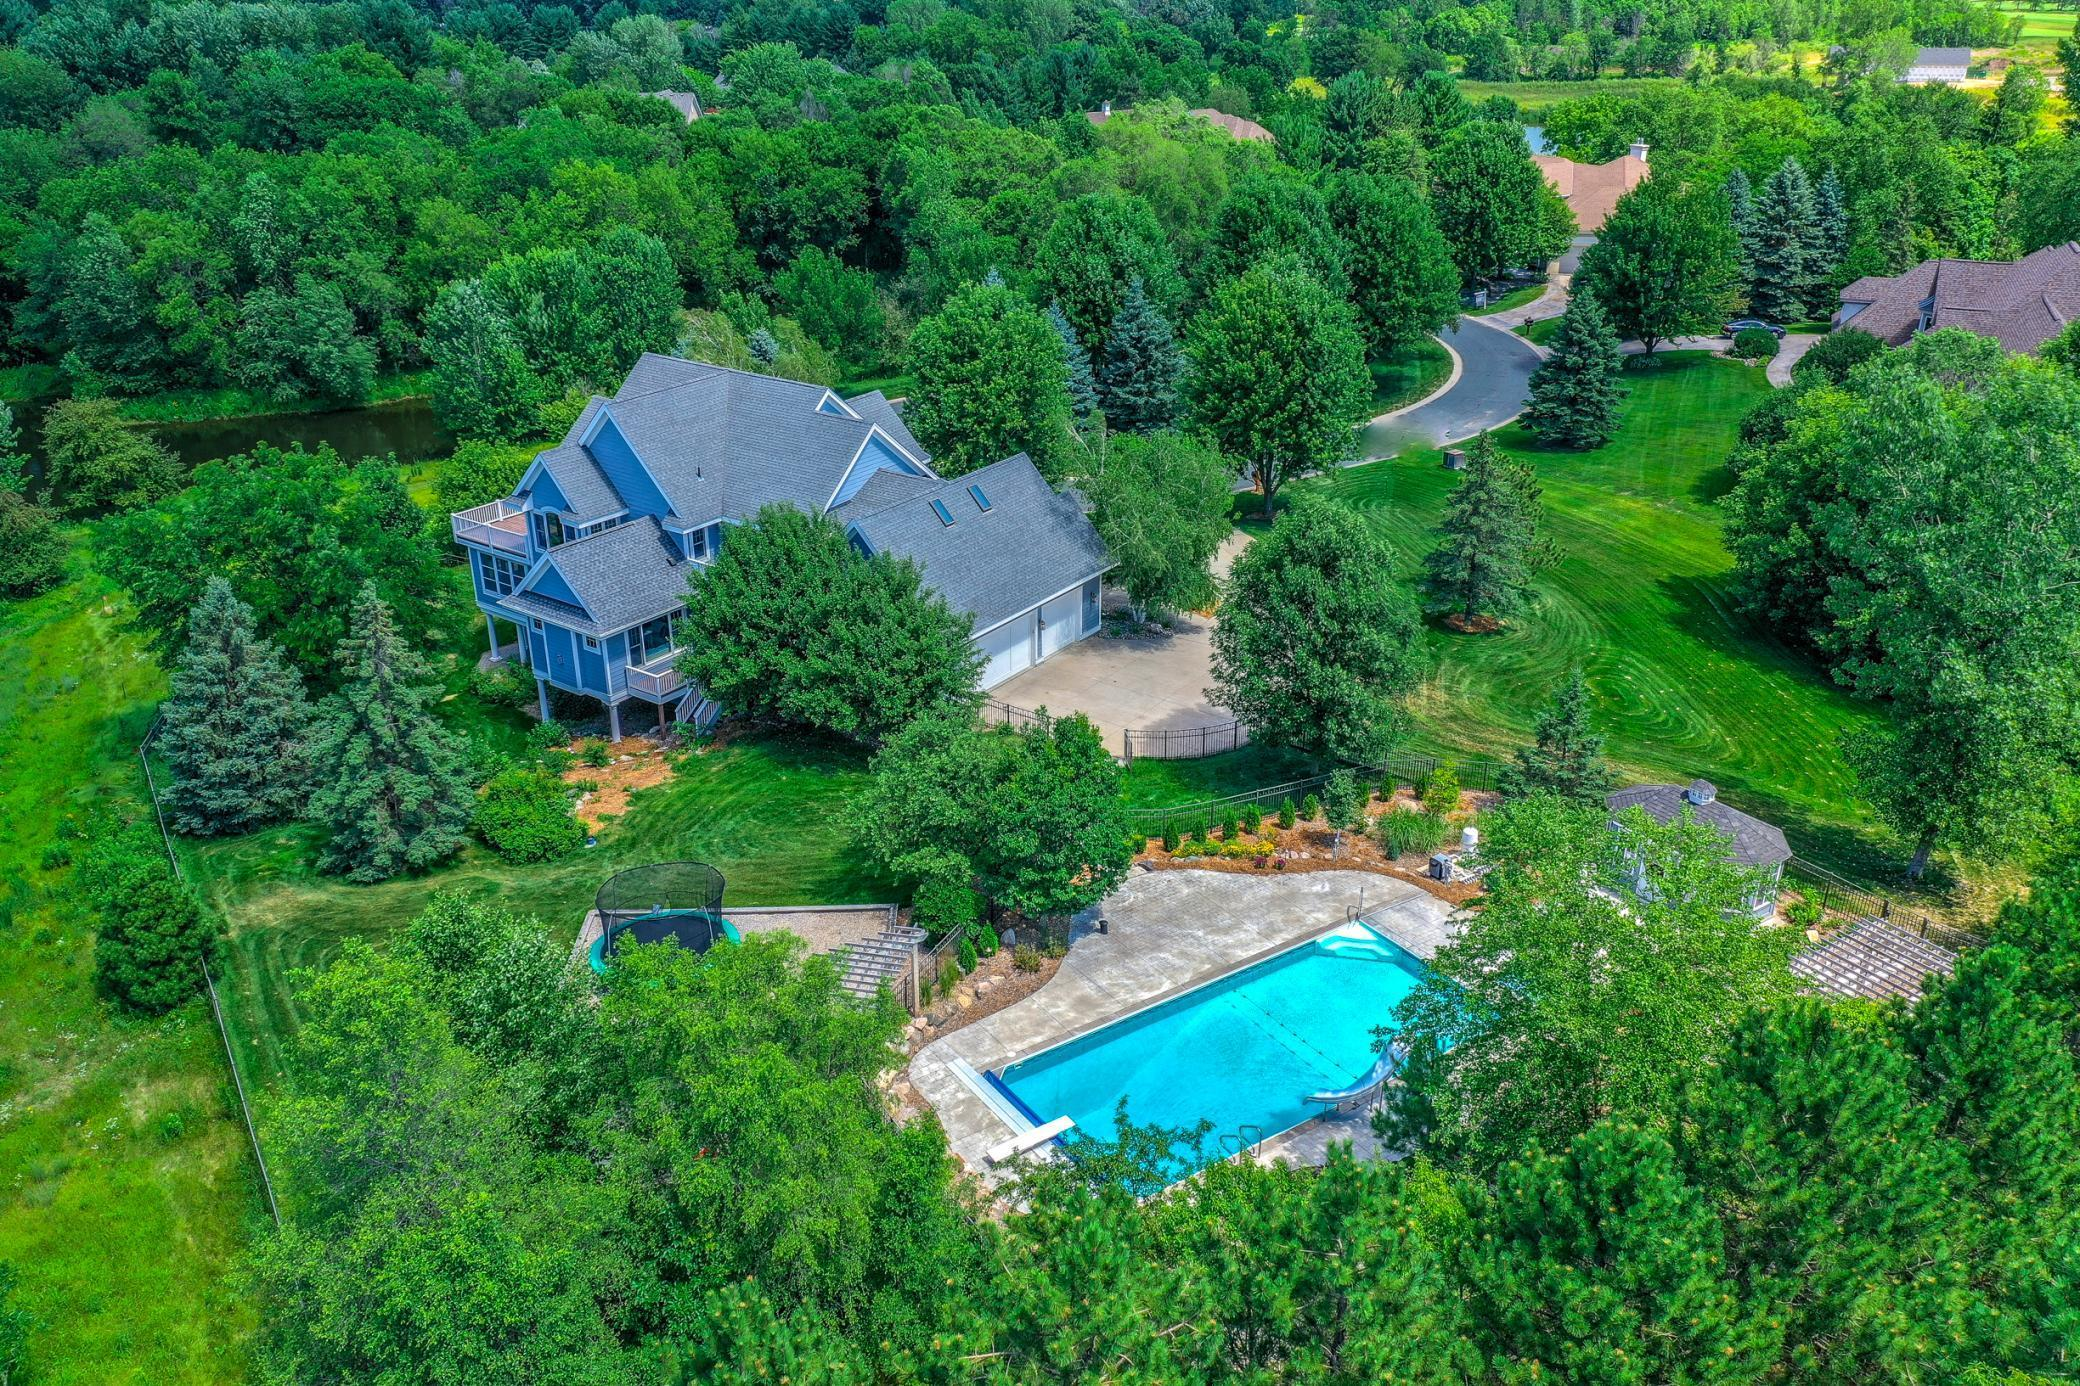 11430 14th N Property Photo - Lake Elmo, MN real estate listing